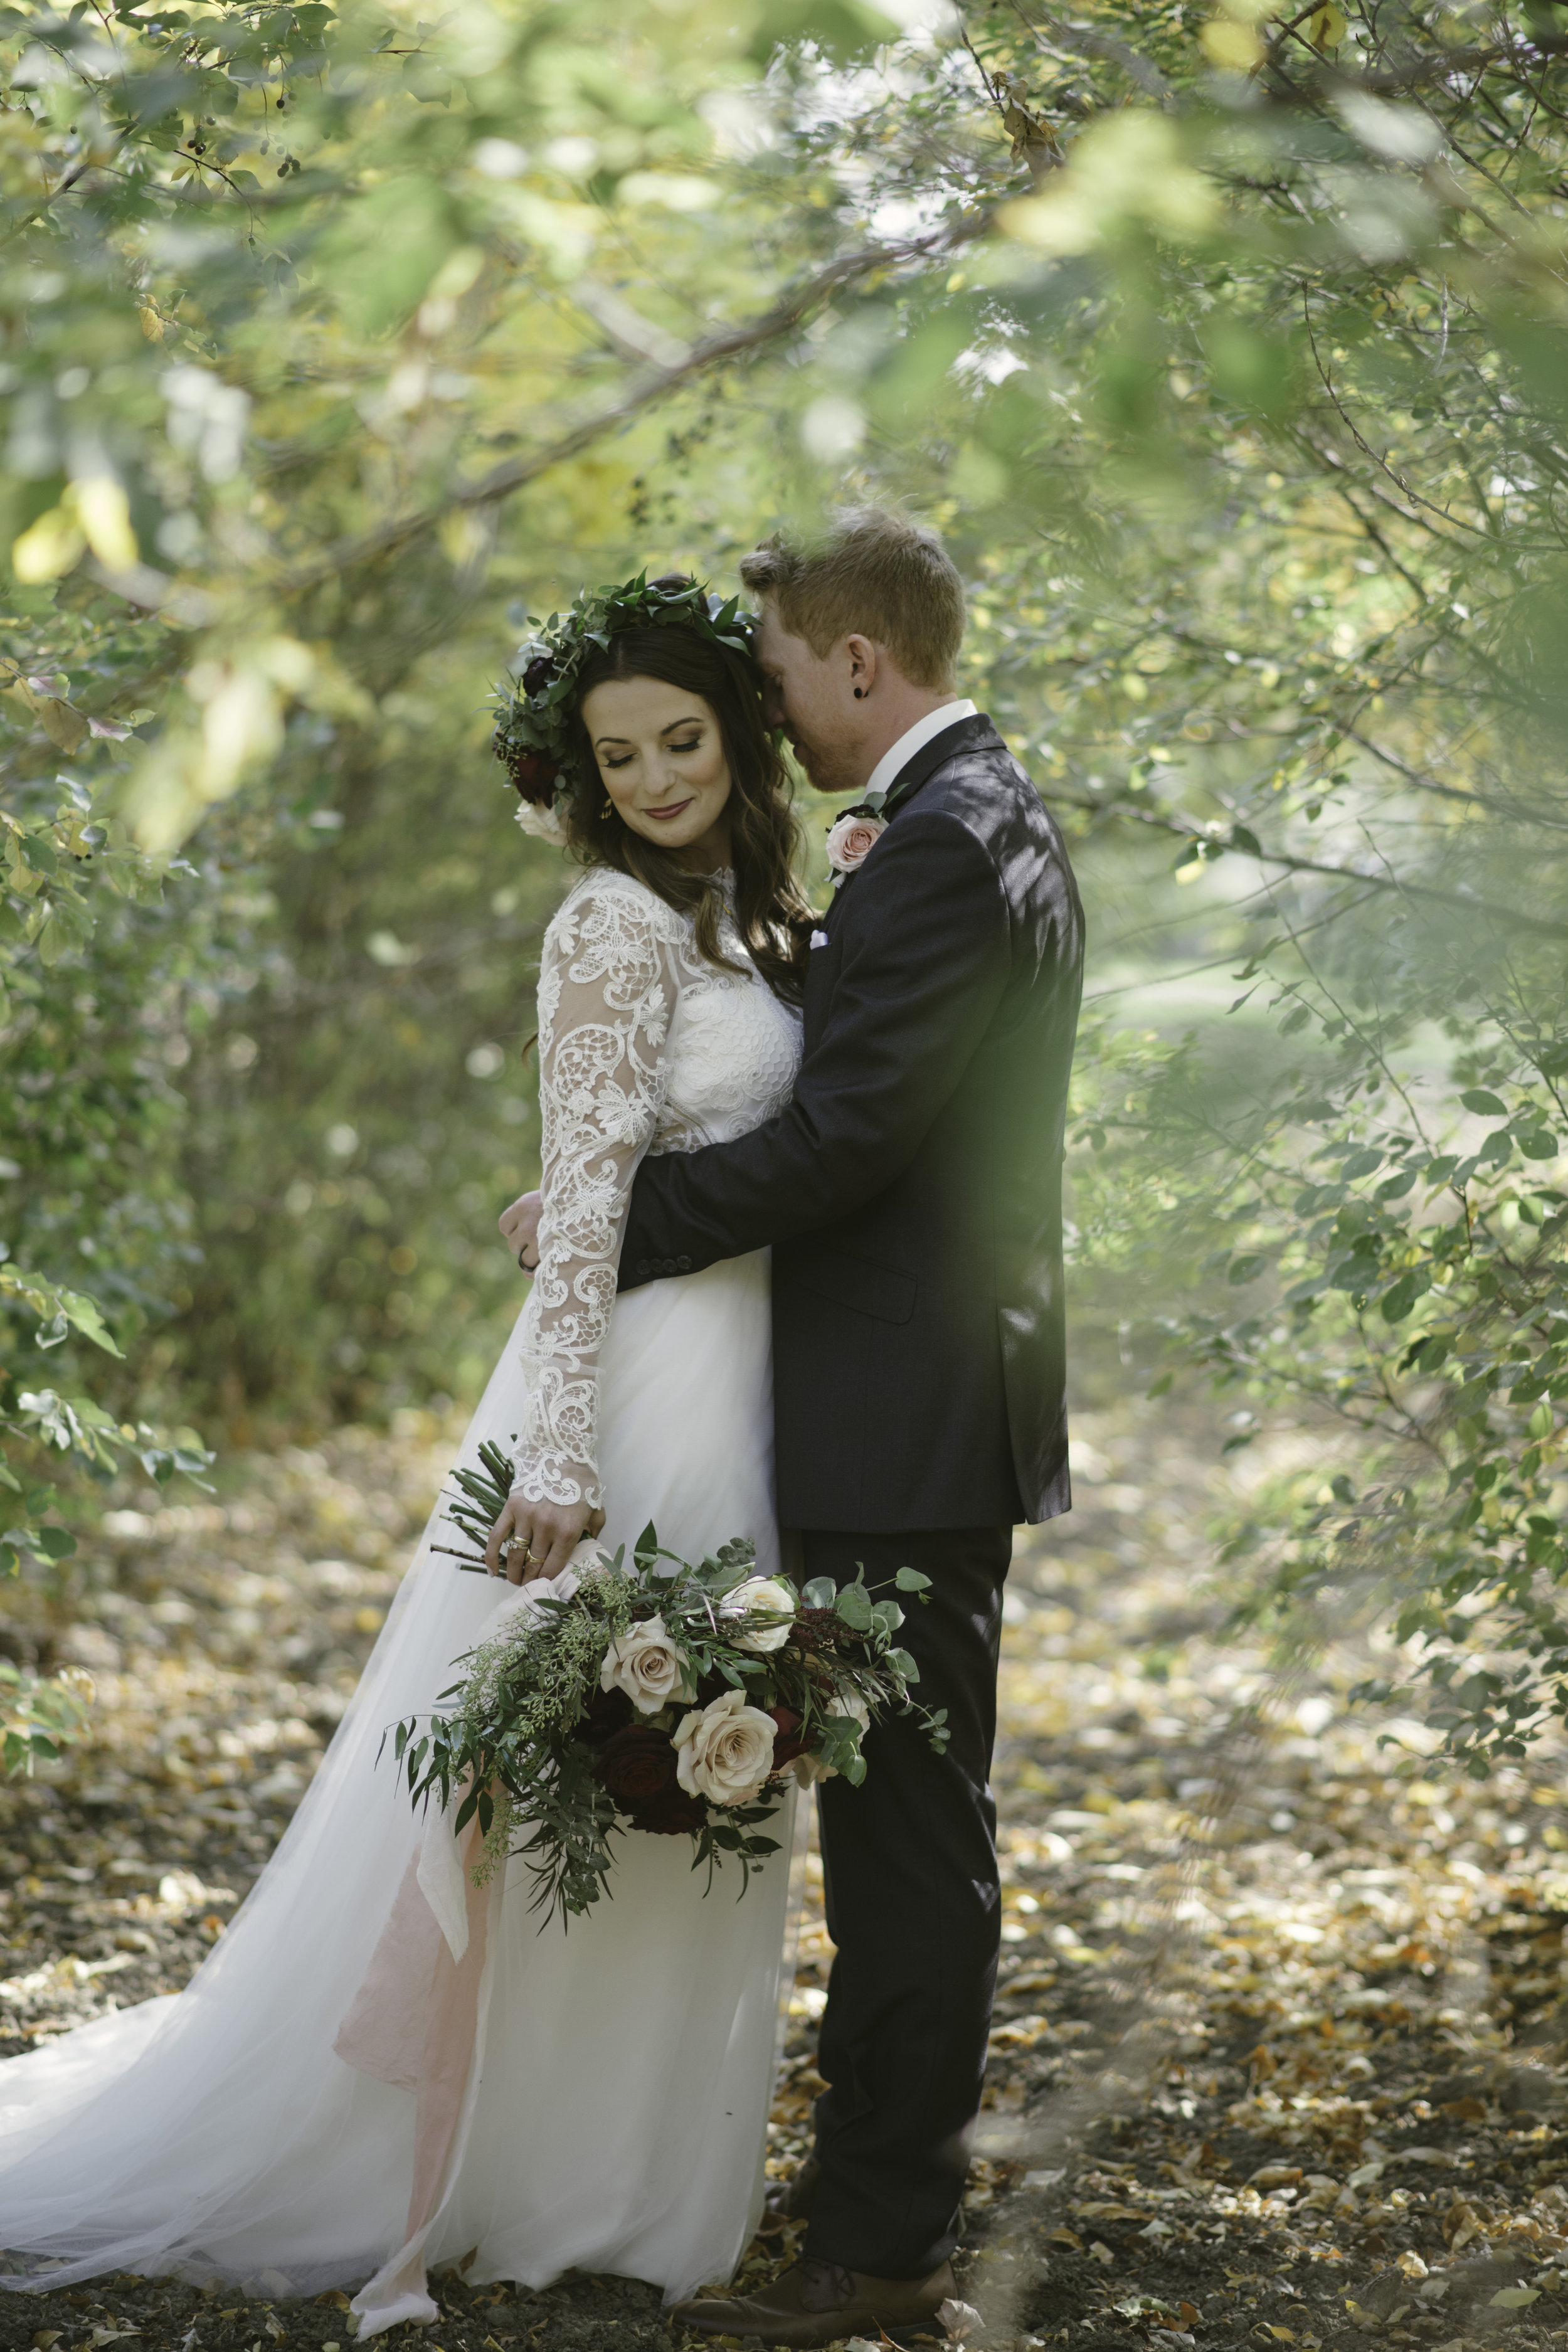 Renee Rude Wedding_Tara Funk Photographer_0014.jpg